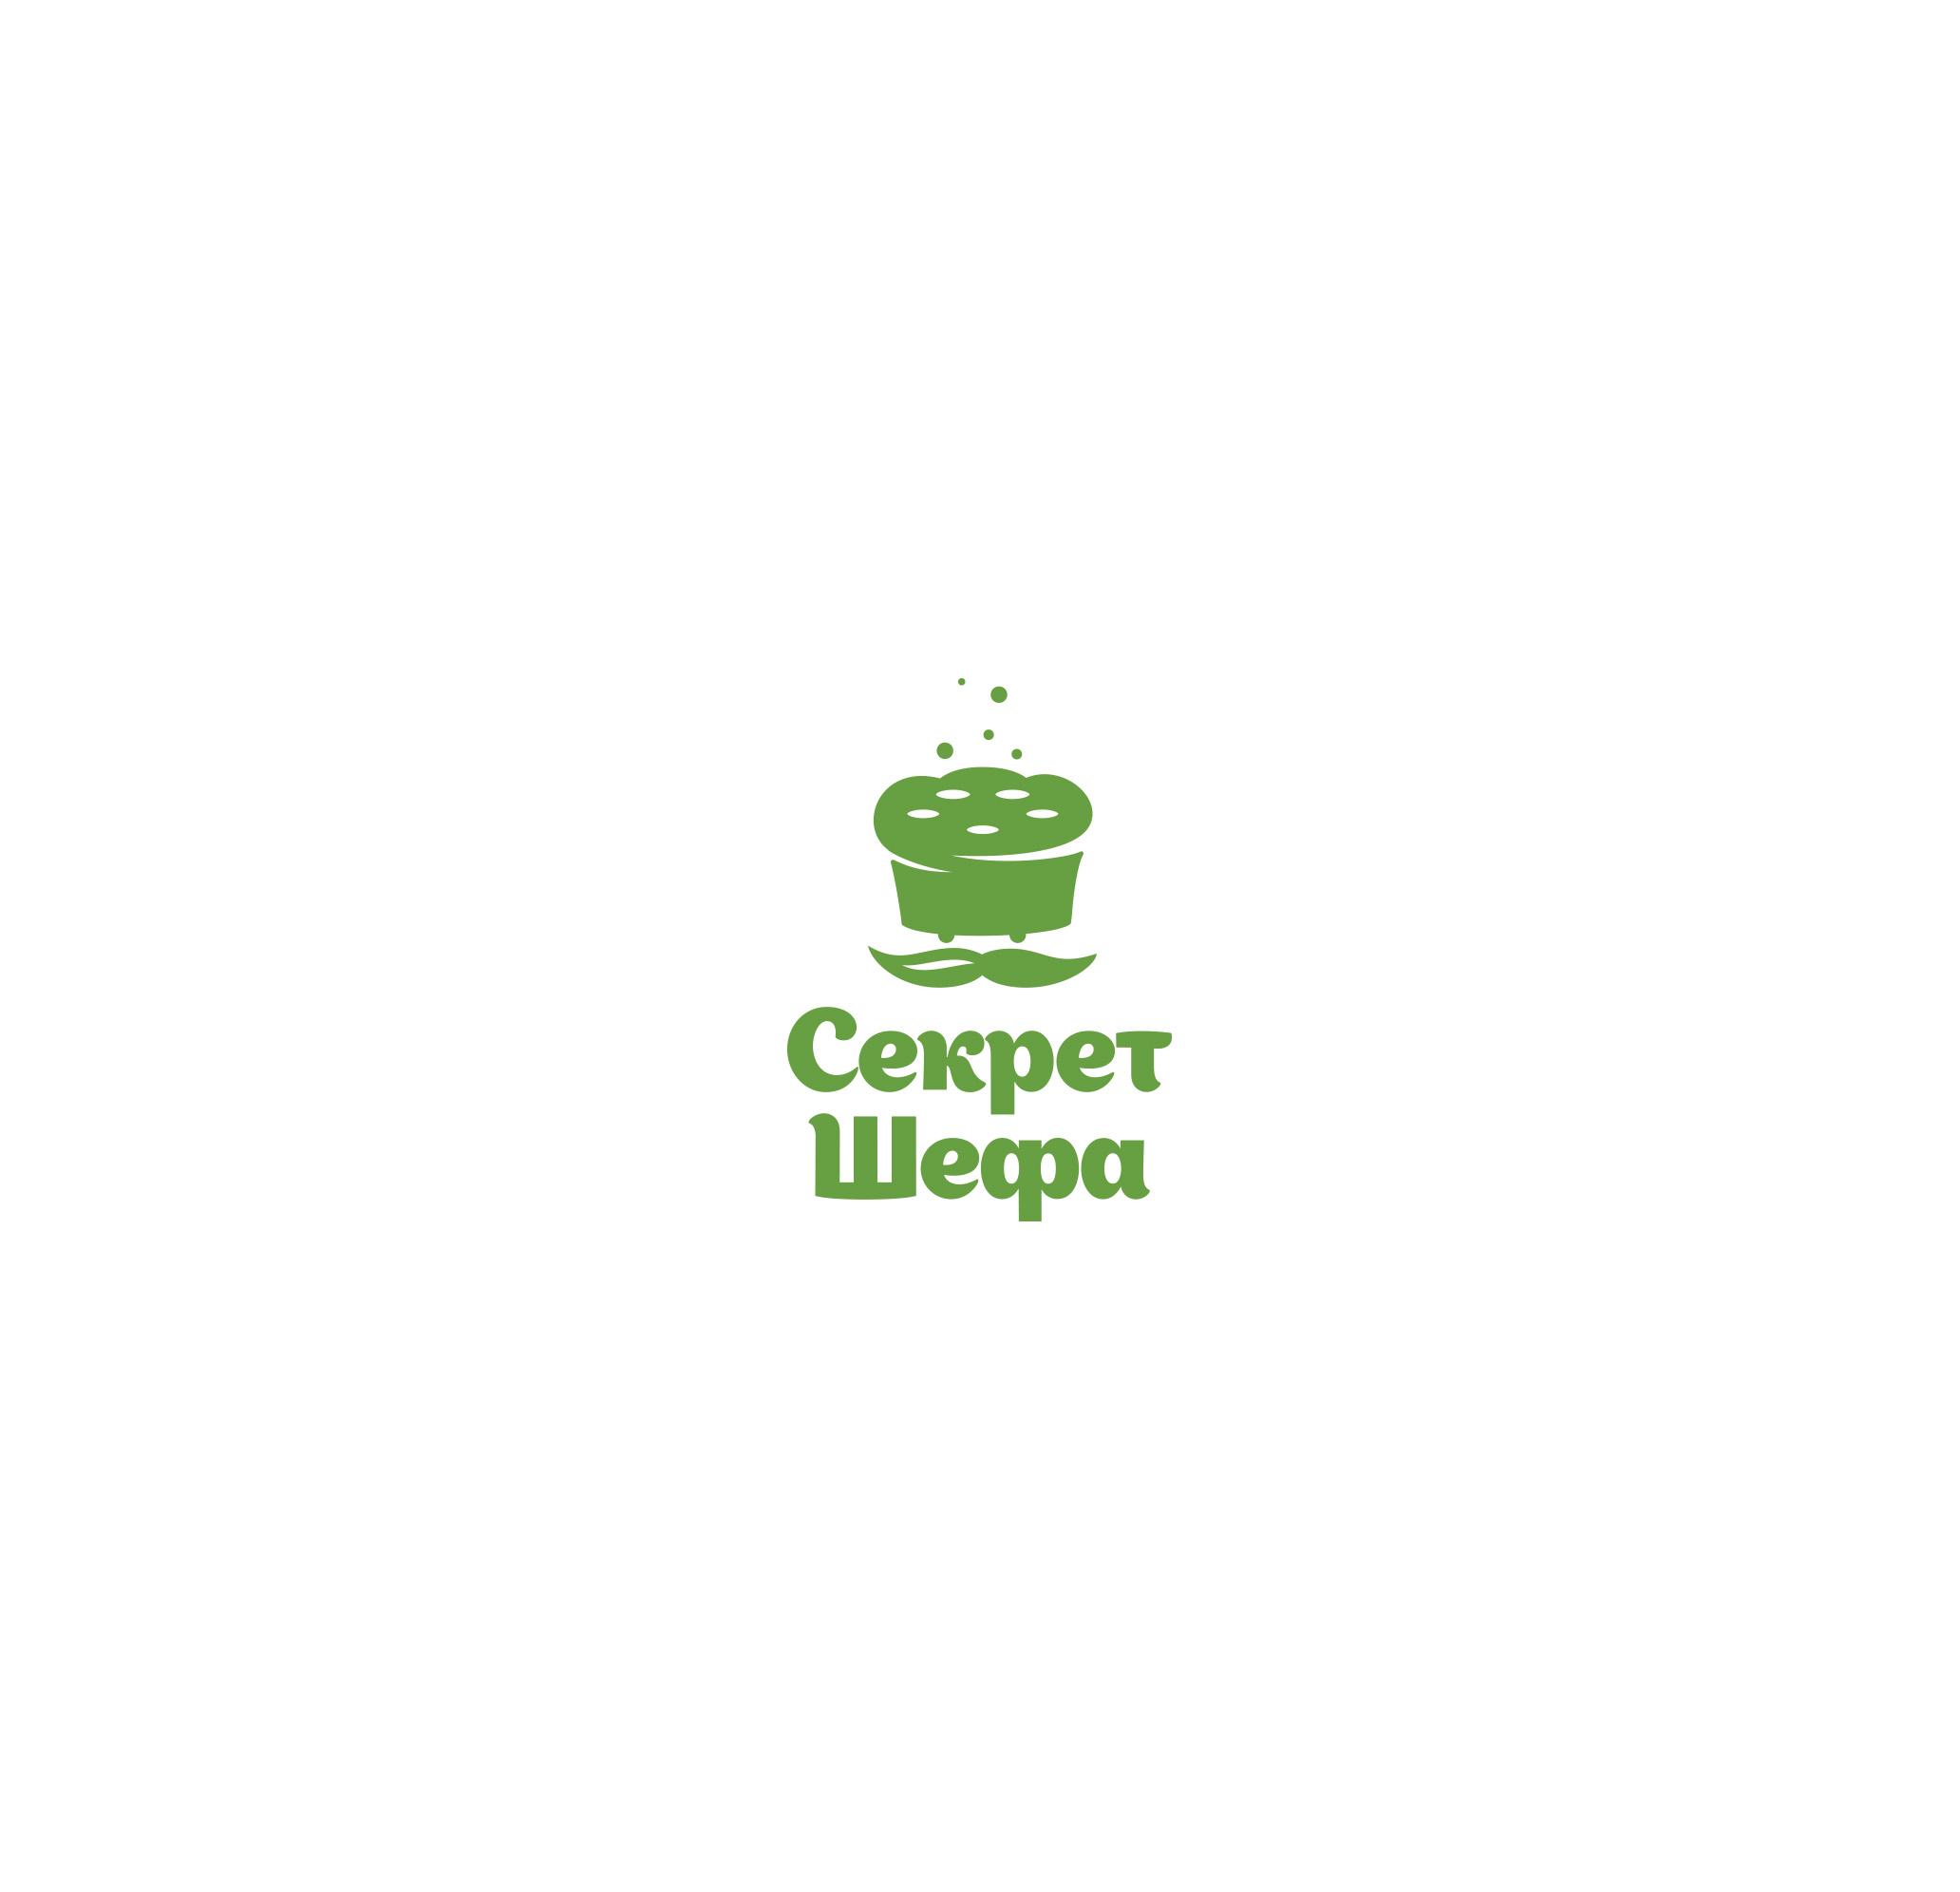 Логотип для марки специй и приправ Секрет Шефа фото f_6345f47572465ec2.jpg